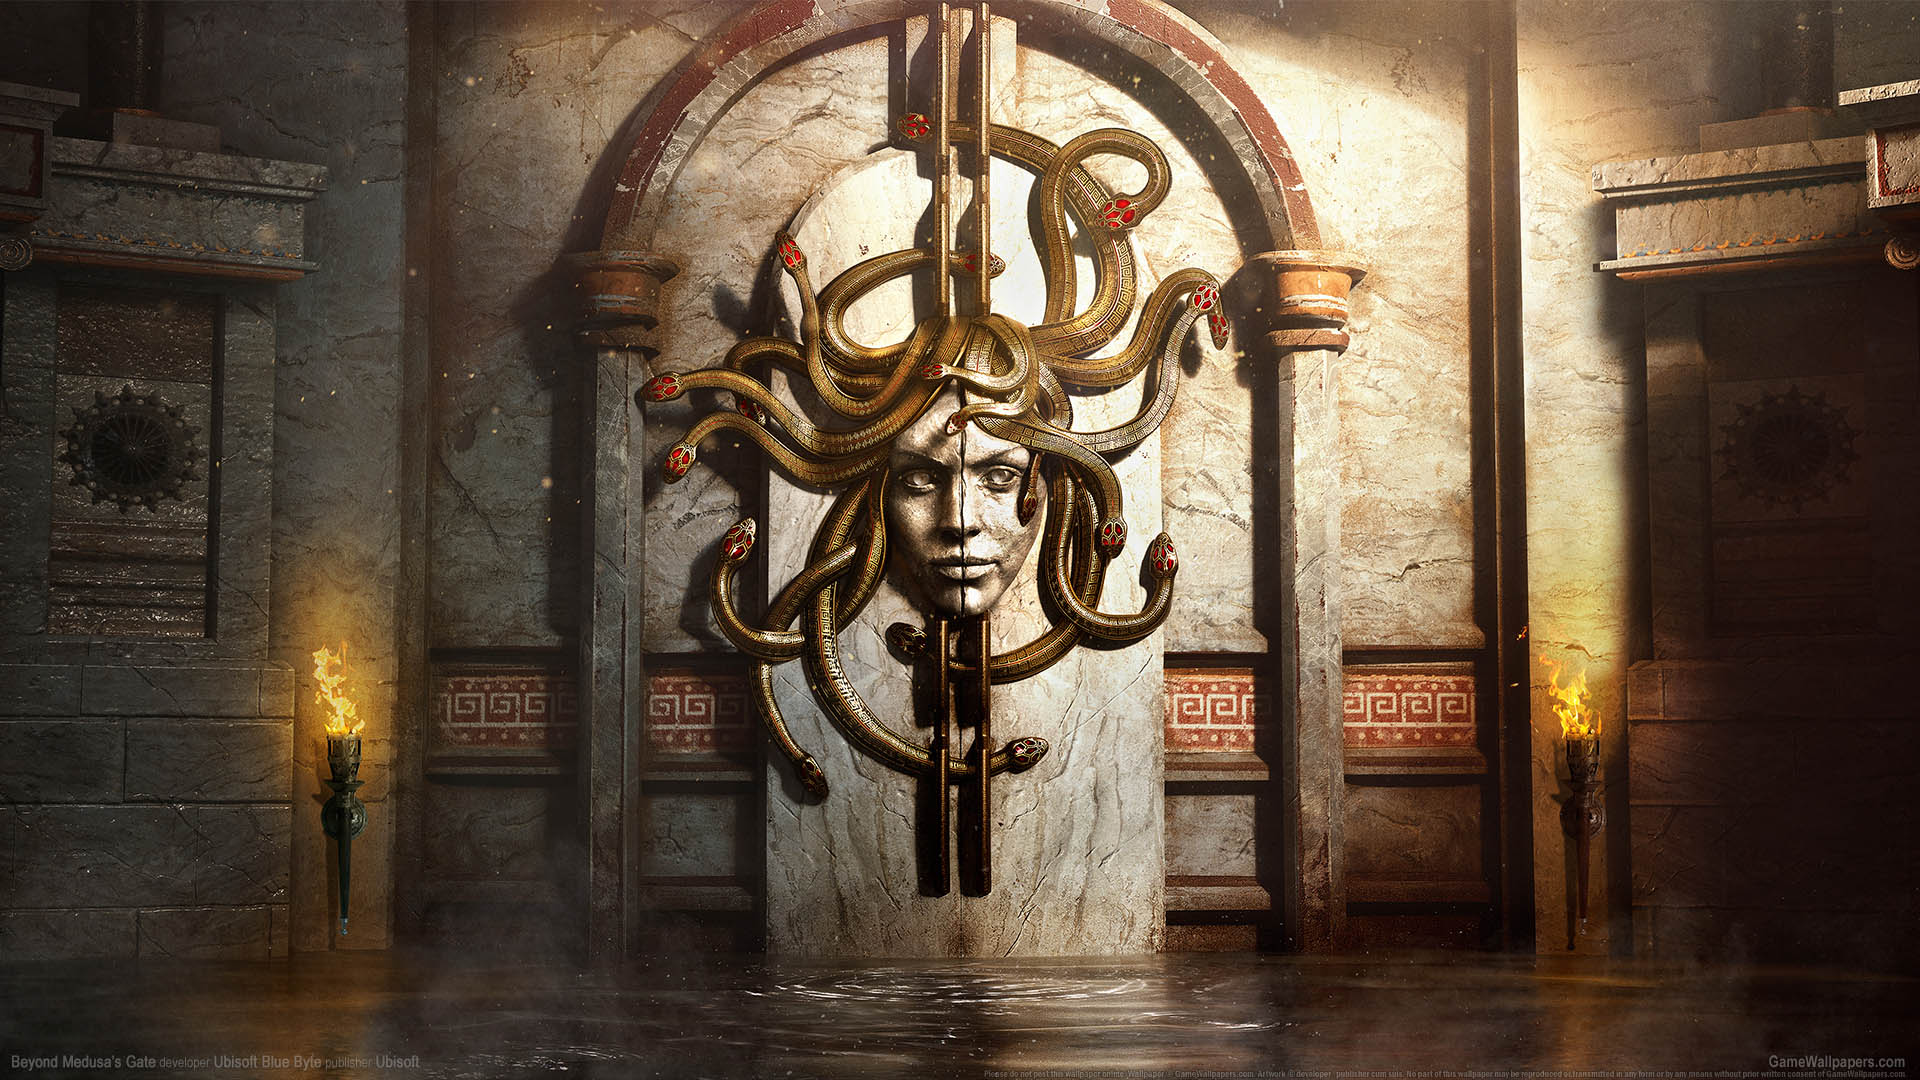 Beyond Medusa's Gate achtergrond 01 1920x1080